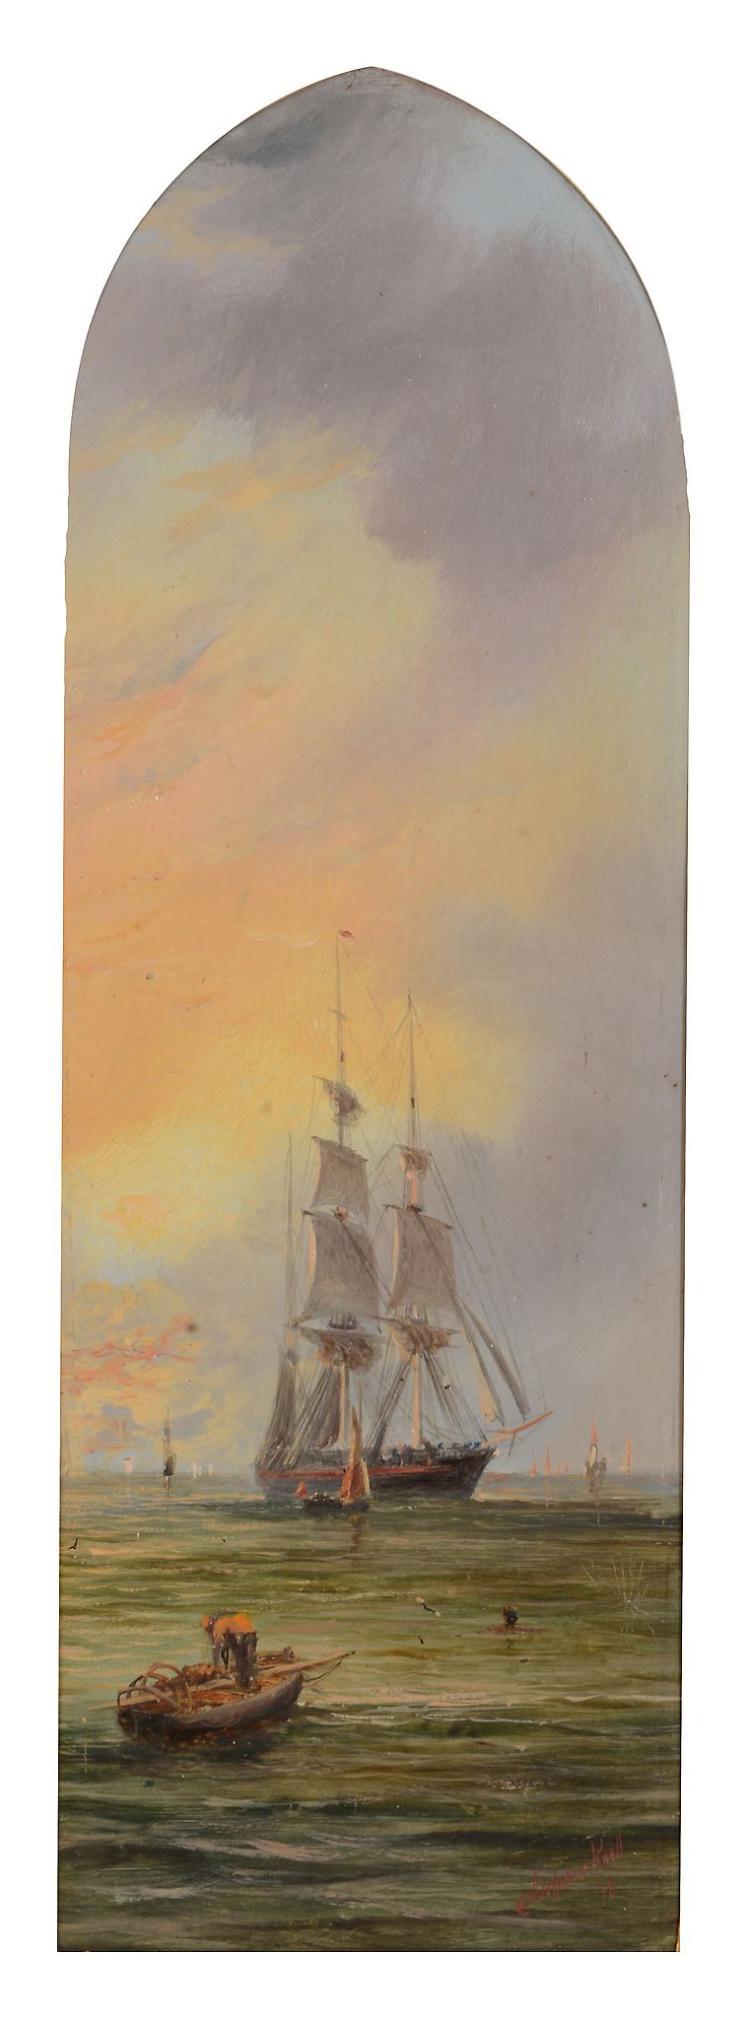 William Adolphus Knell (1802 - 1875) - Morning;Evening, a pair